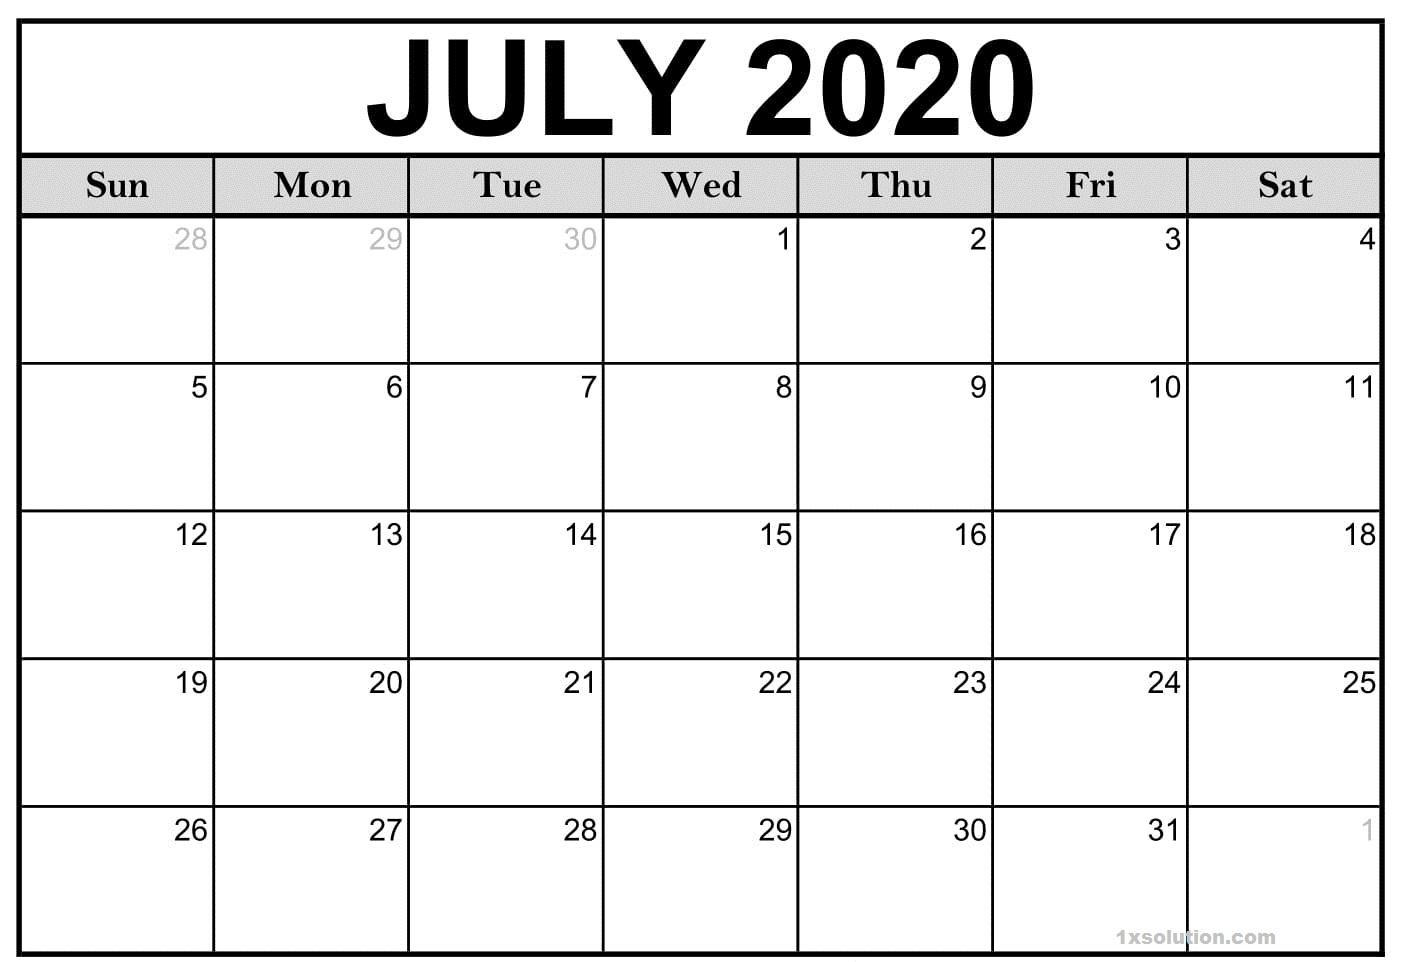 July 2020 Calendar Download